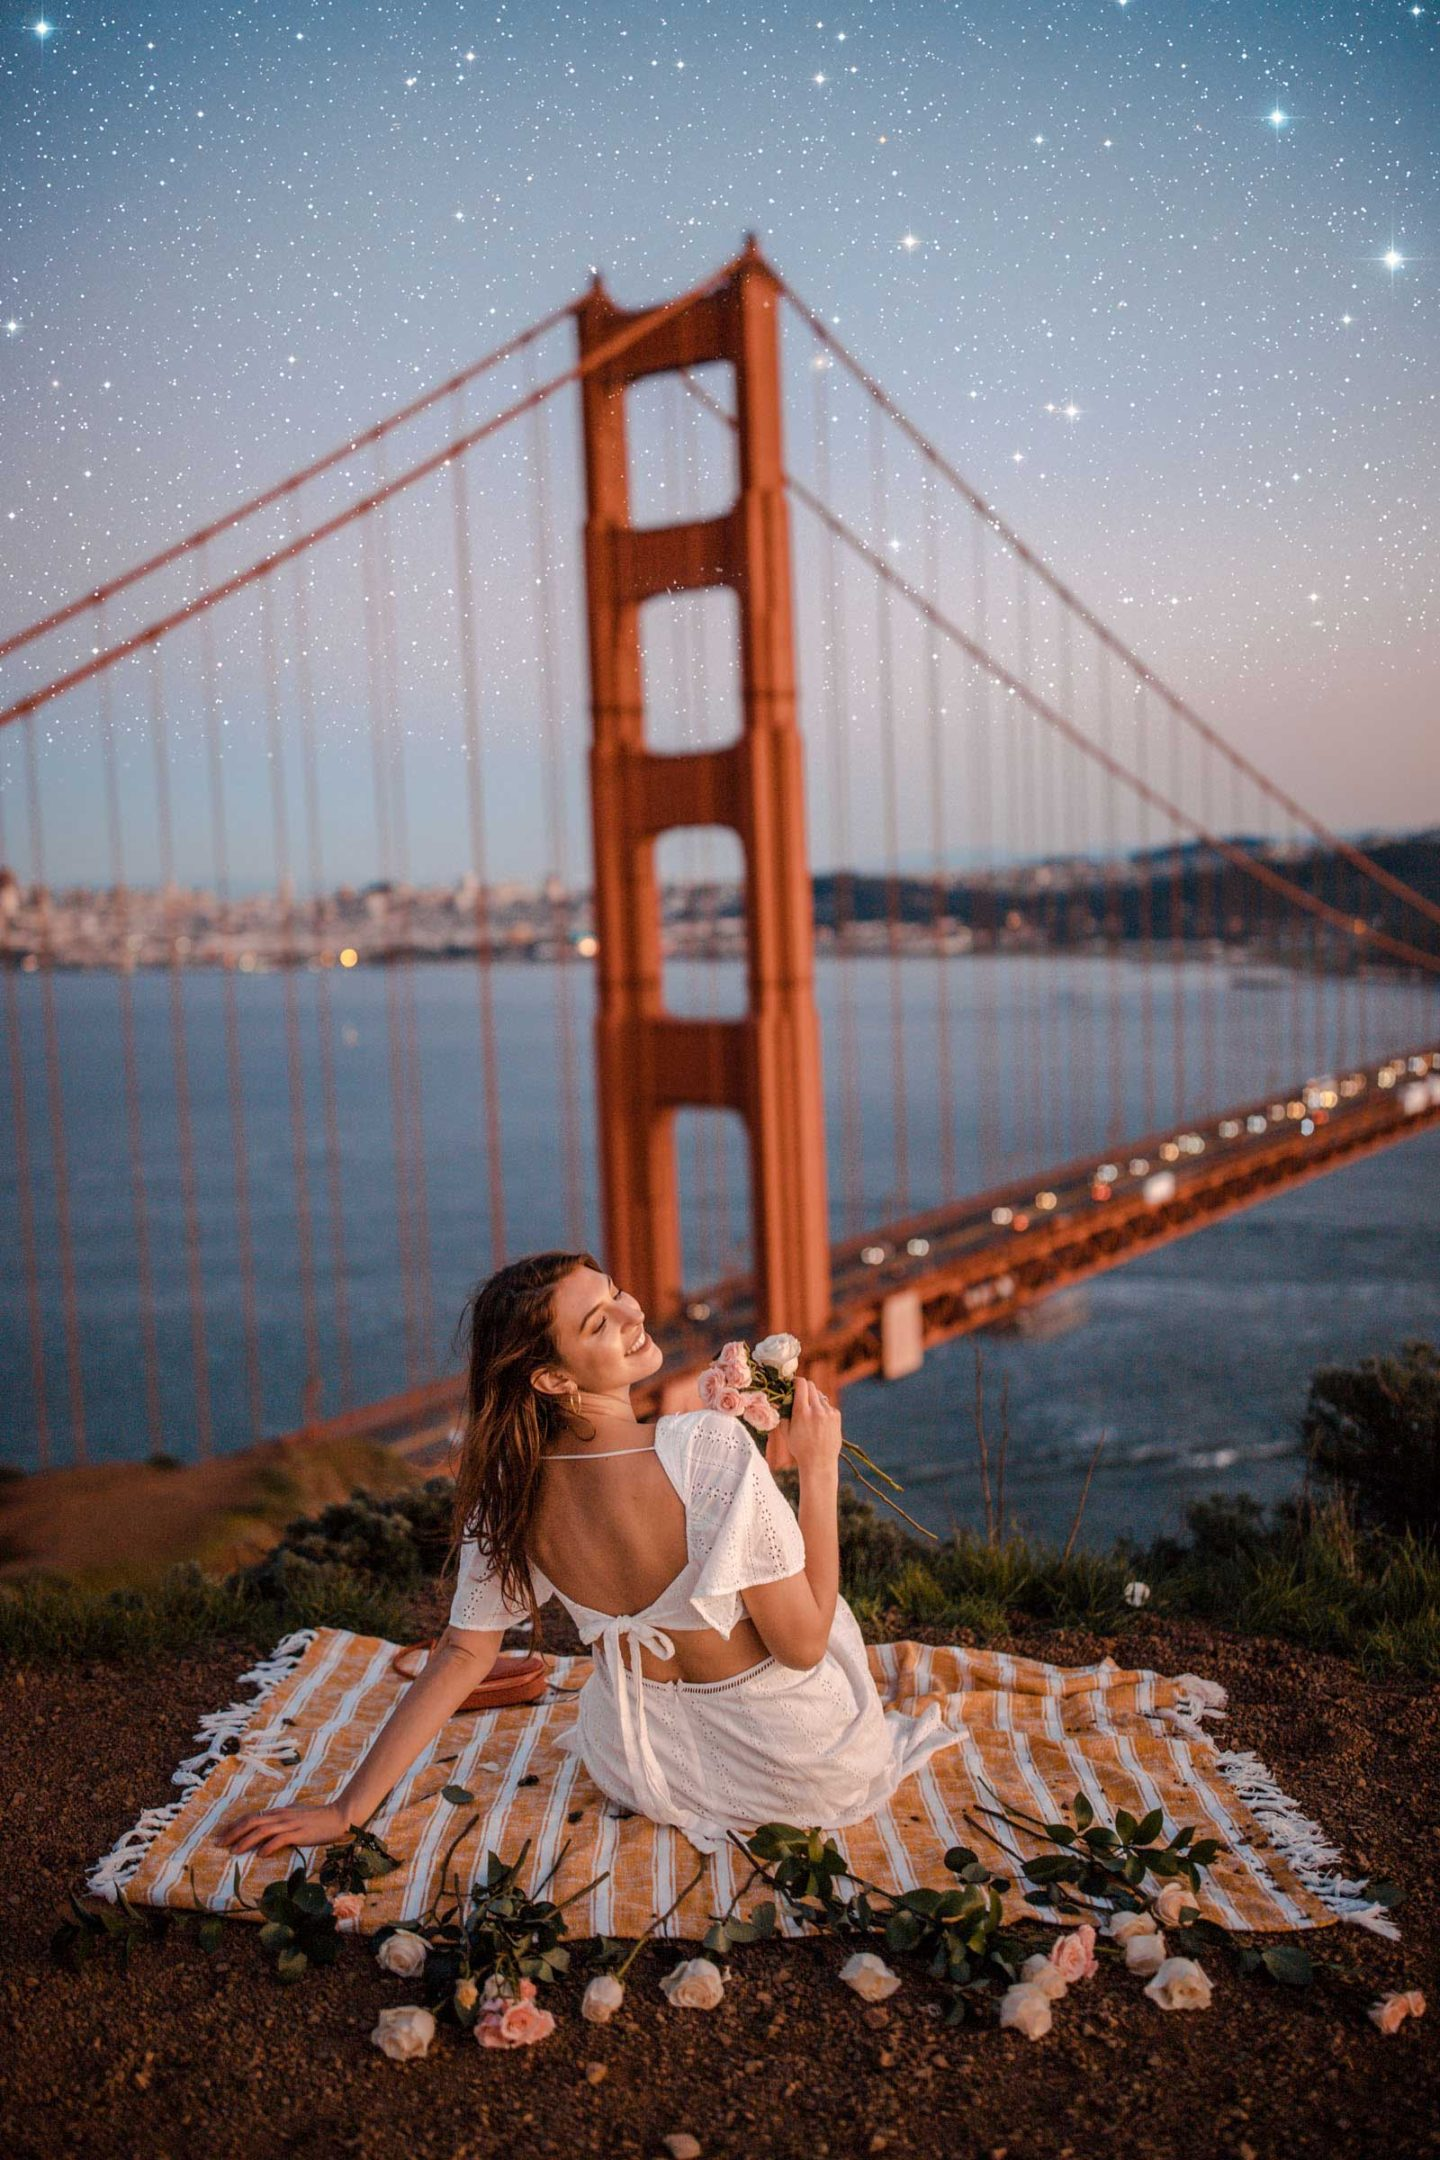 Easy photoshop tutorial. How to add stars quick in photoshop. San Fransisco Golden Gate Bridge Sunset